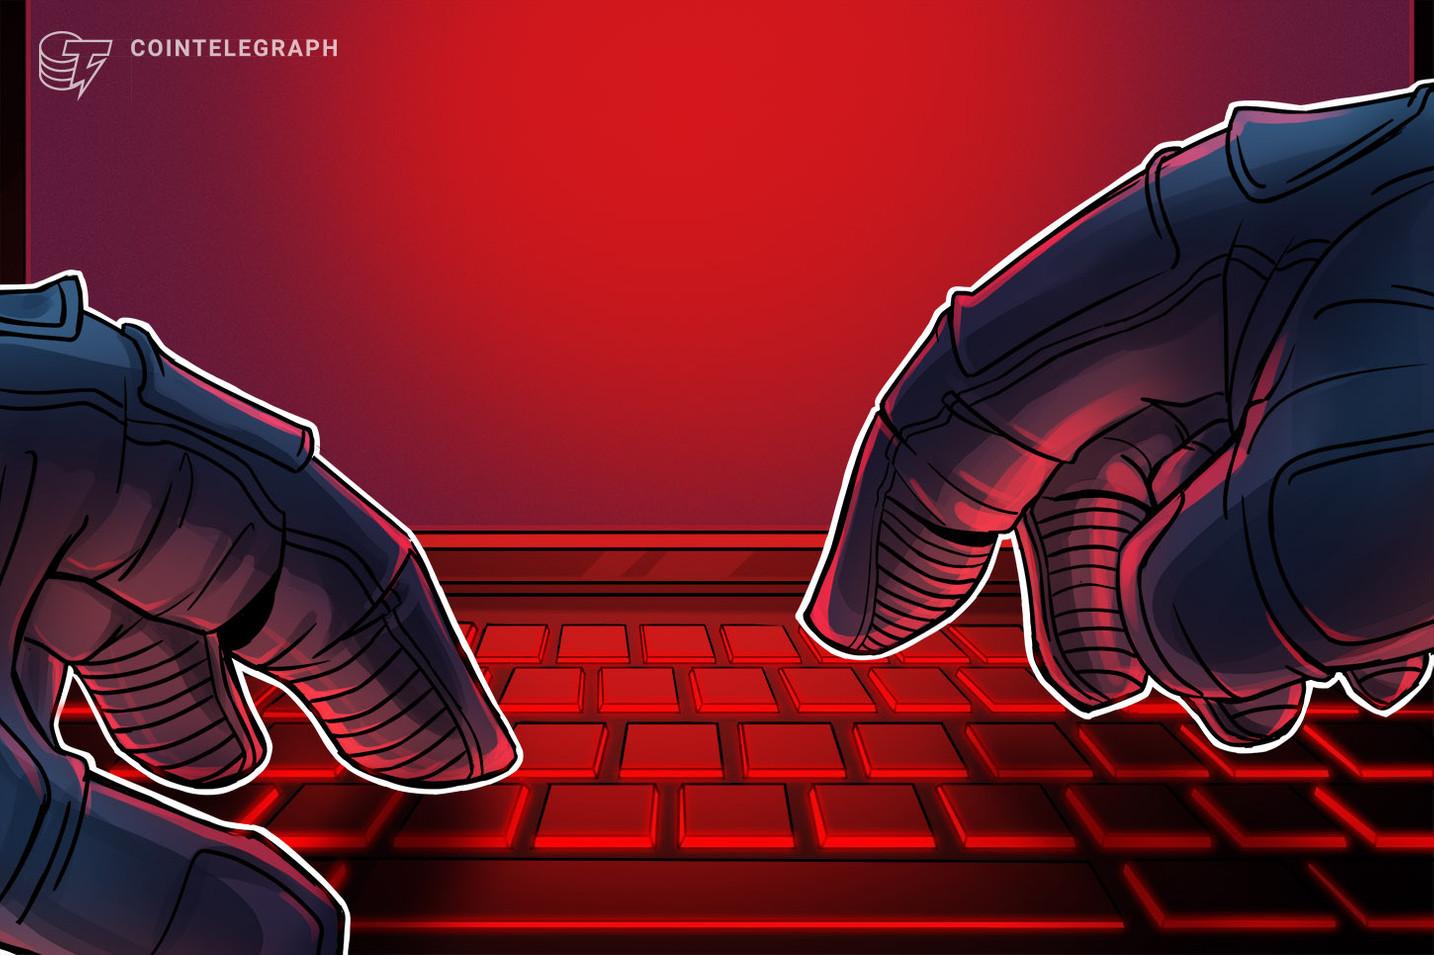 El grupo de hackers Maze afirman haber infectado con ransomware al gigante de seguros Chubb